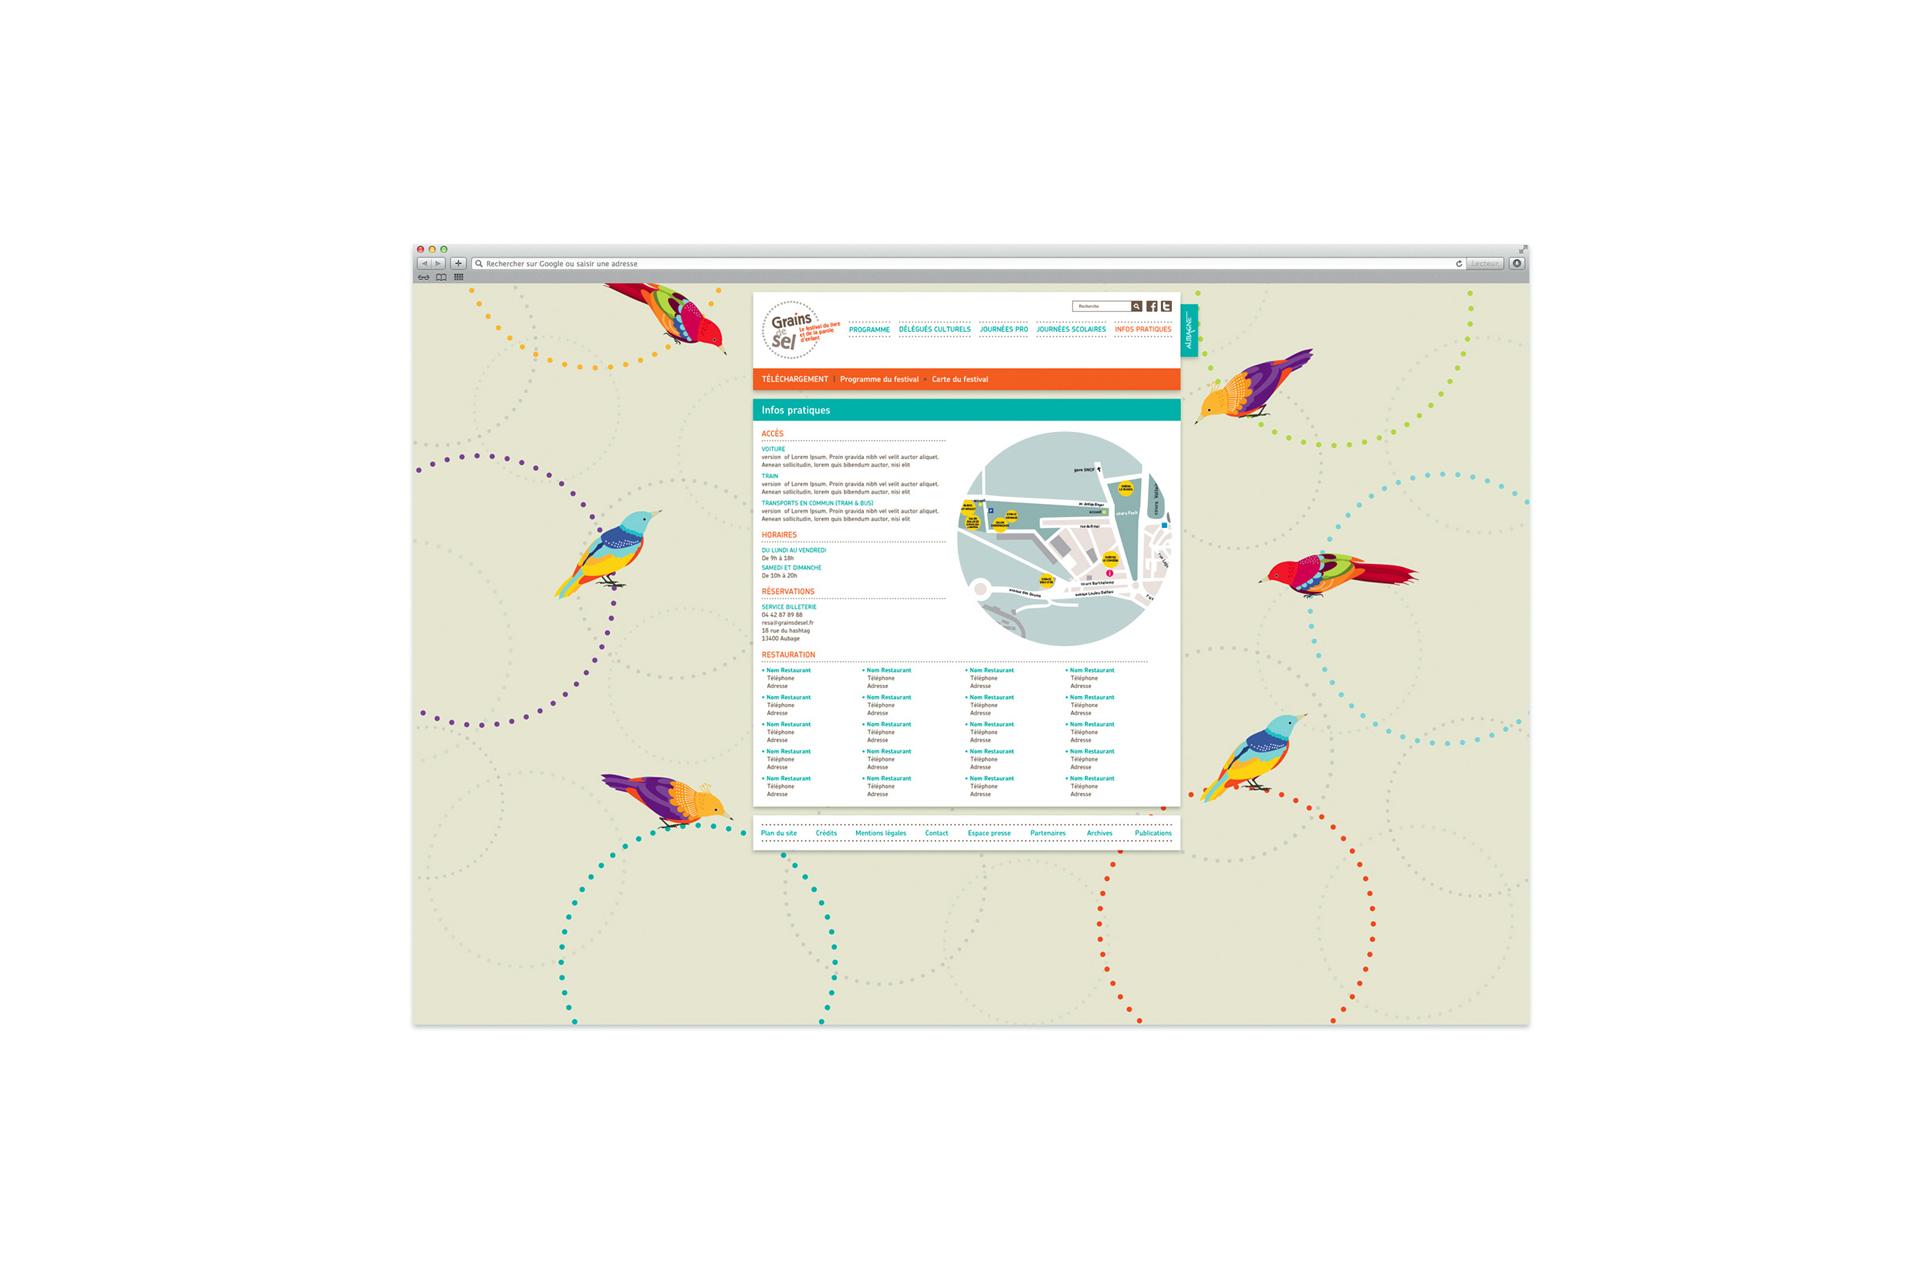 GDS-2014-Navigateur-Infos copie